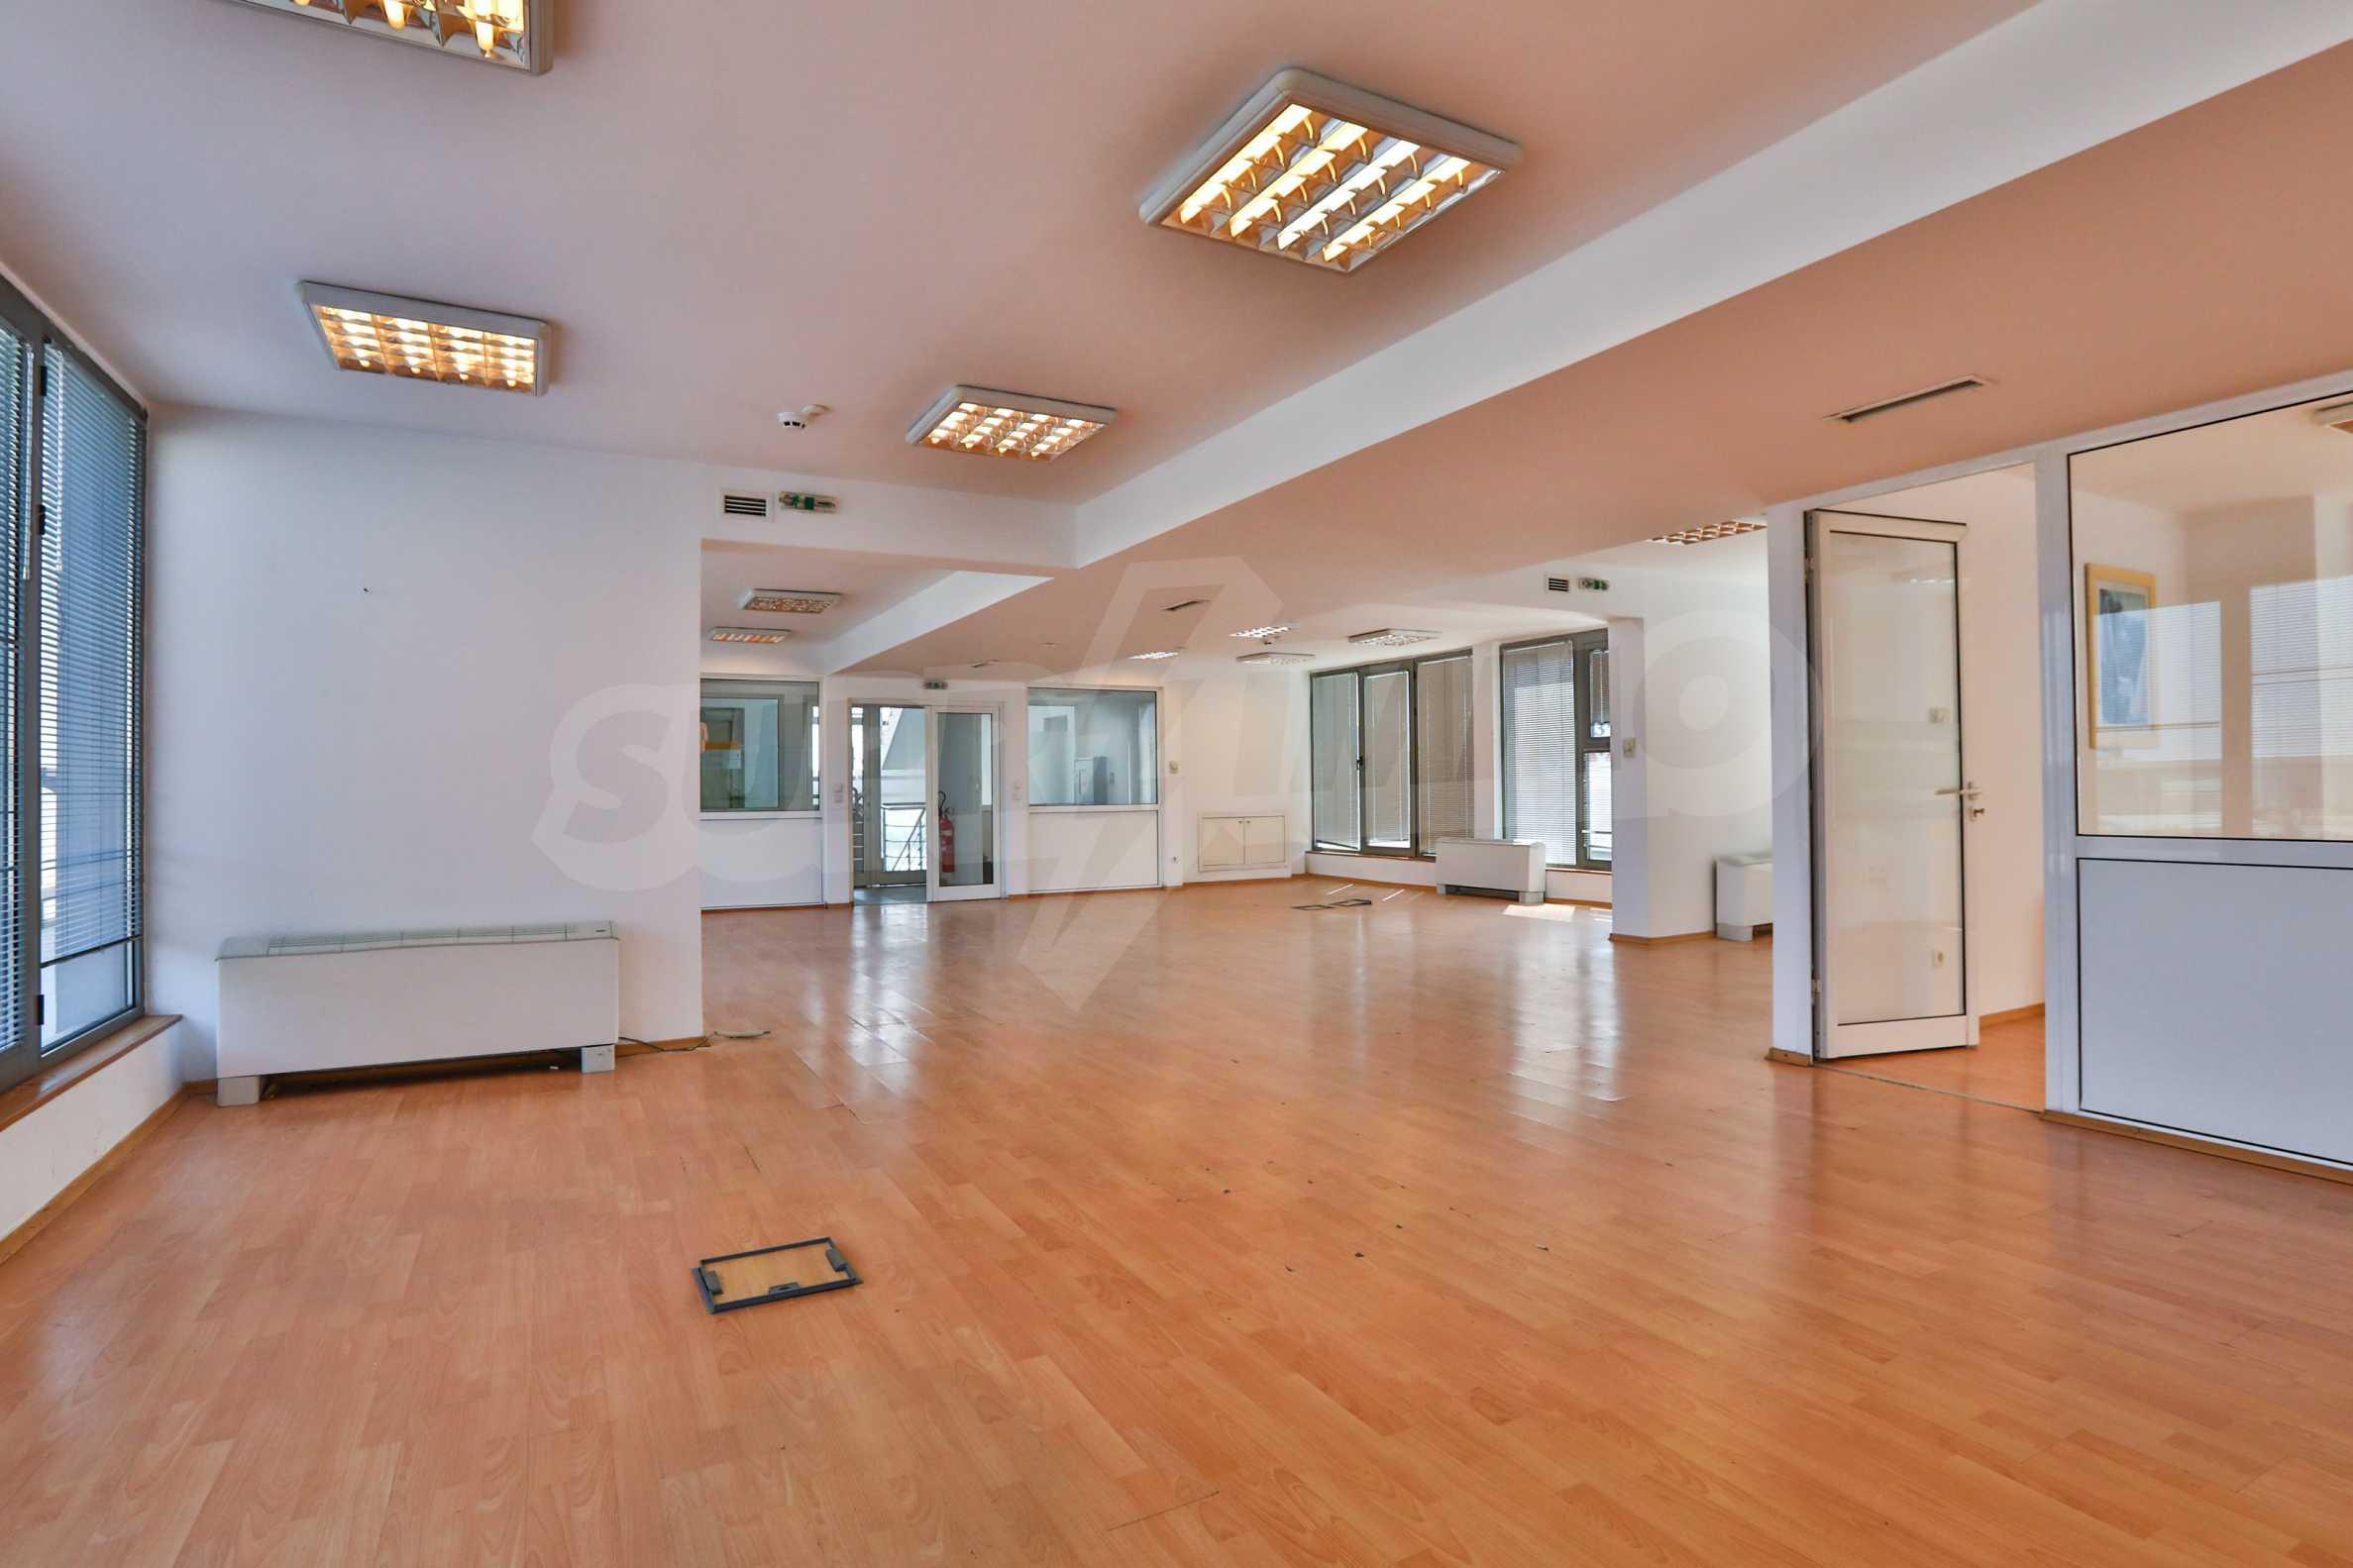 Офис в бизнес сграда висок клас на бул. Цариградско шосе 14